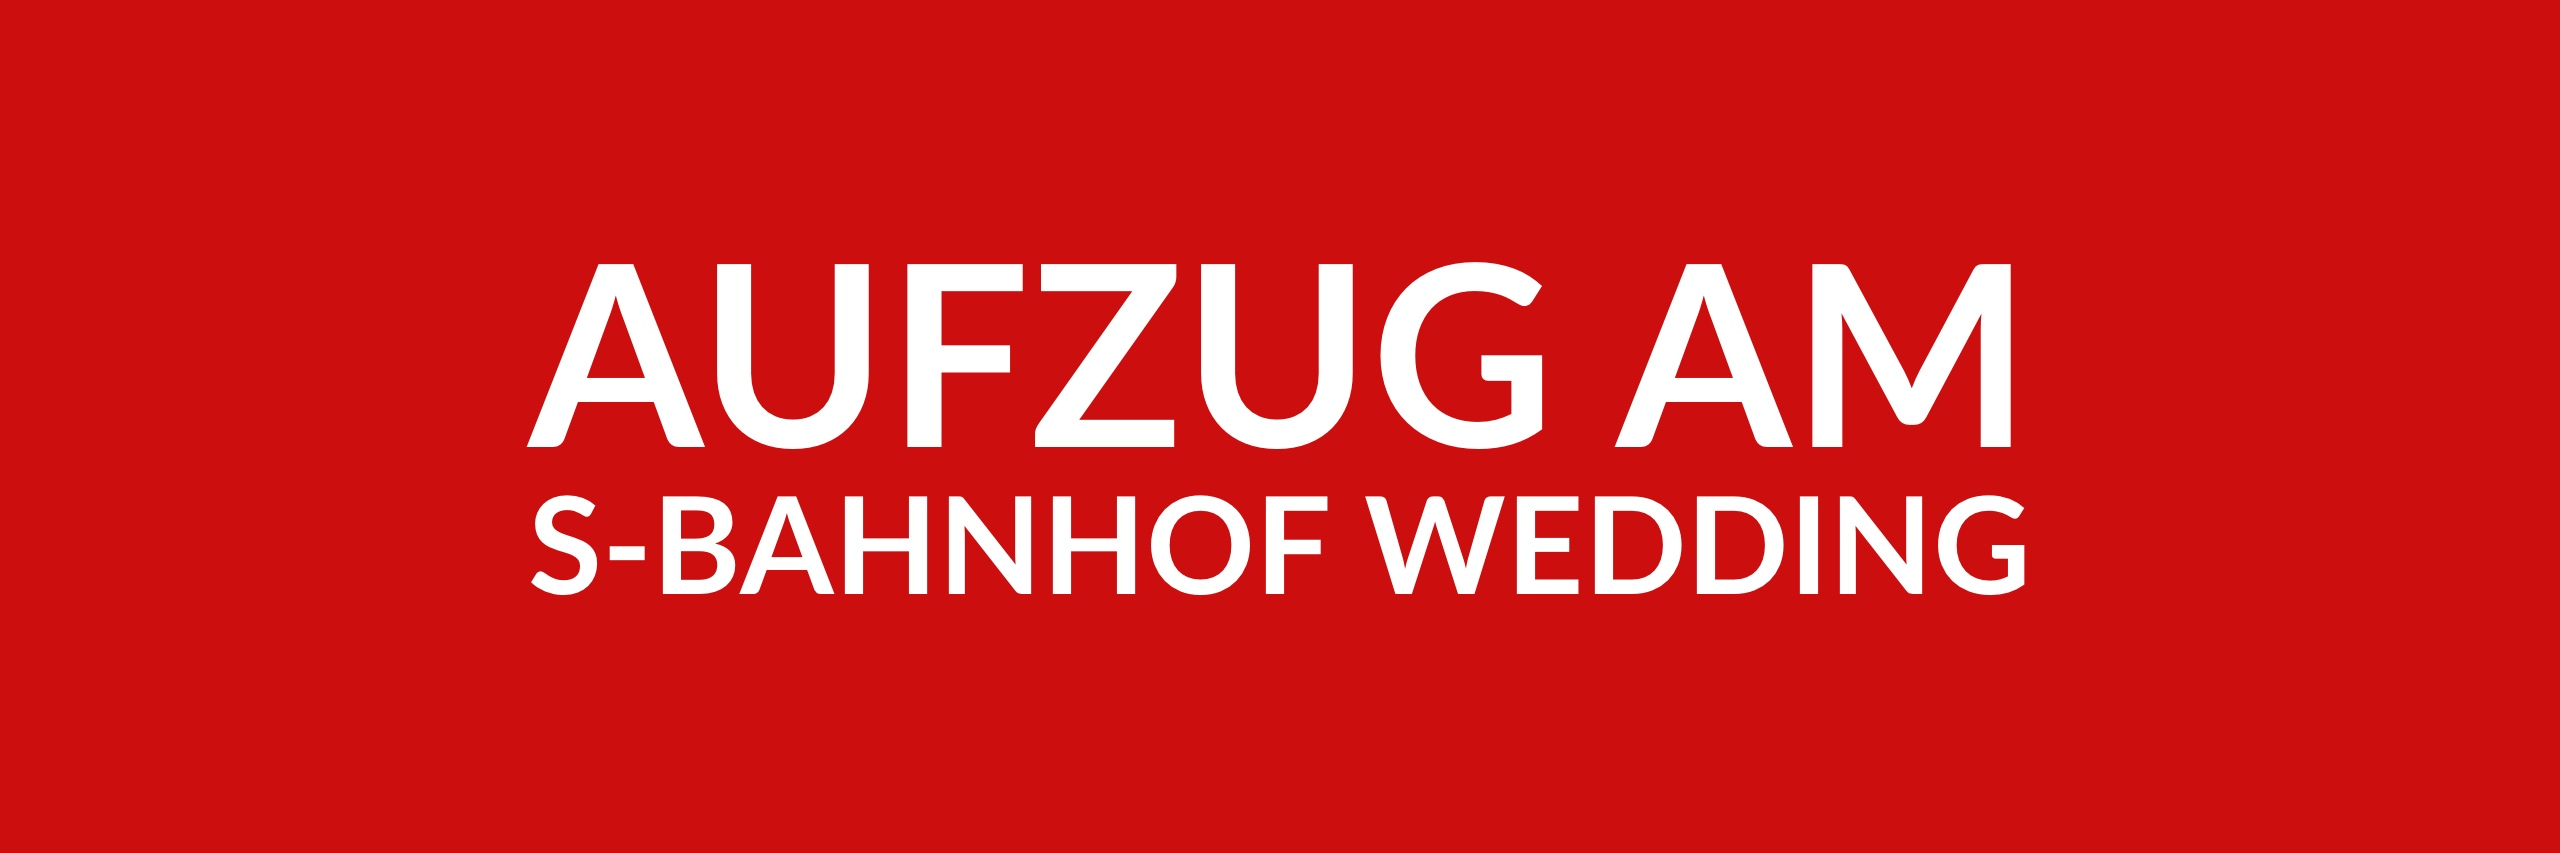 Anfrage 'Aufzug am S-Bahnhof Wedding' (PDF)